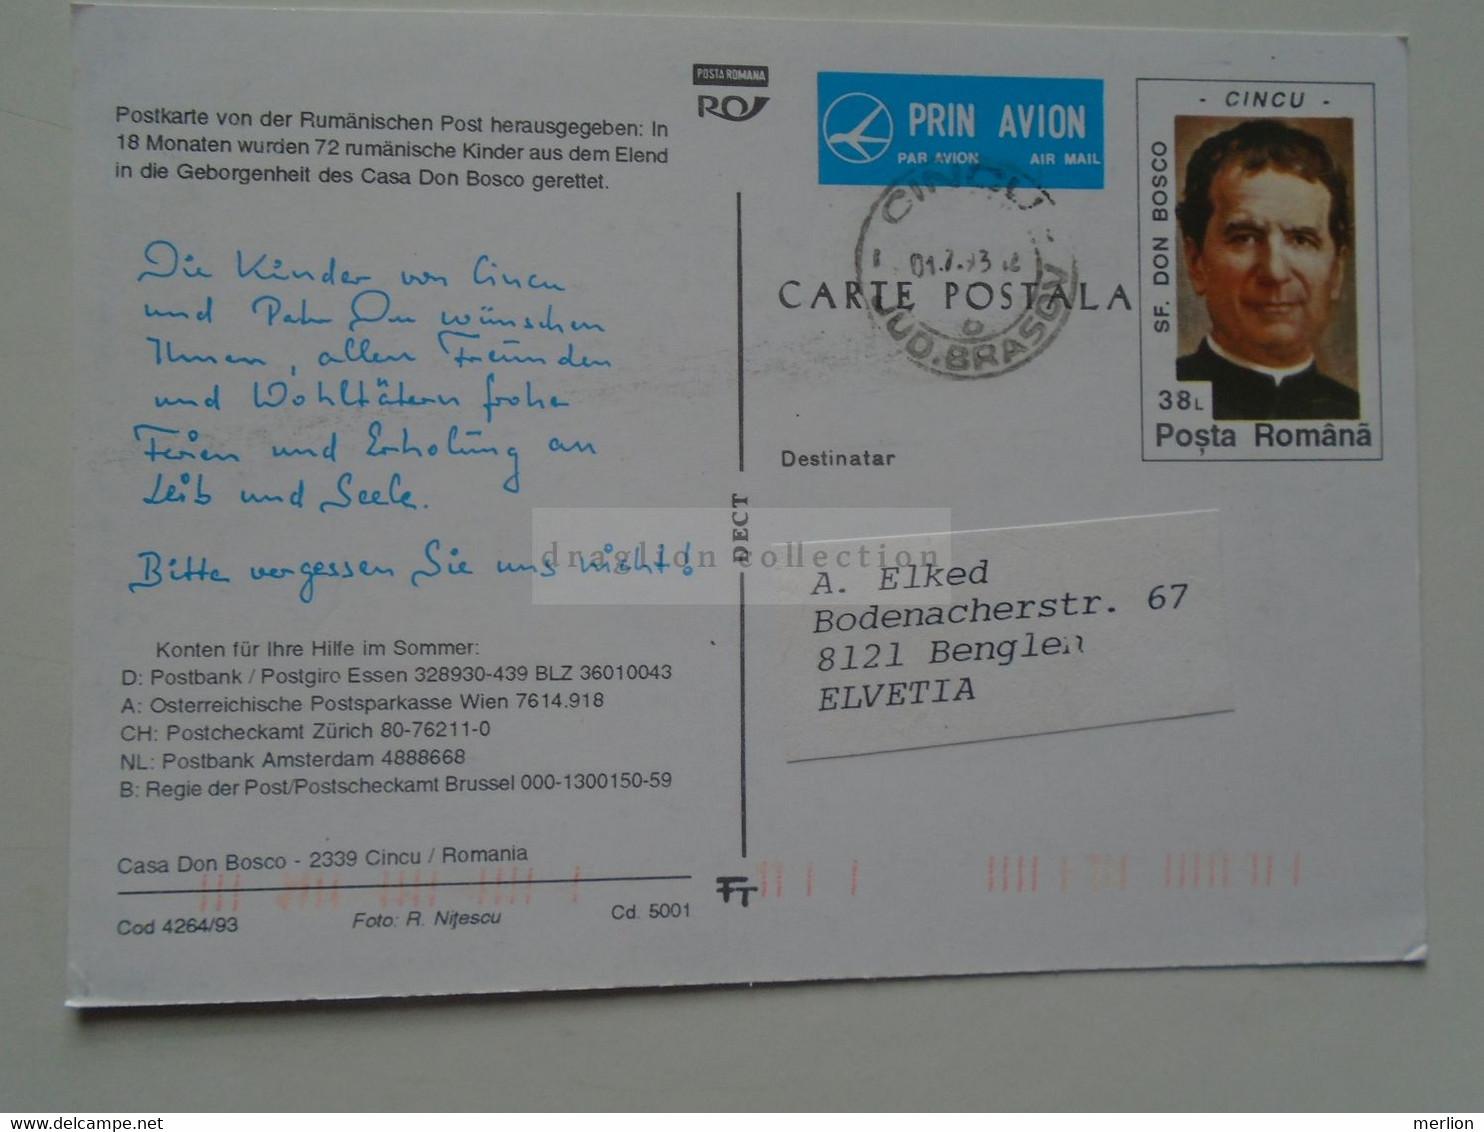 D179372 Romania   Postal Stationery  Casa Don Bosco   CINCU  - Cancel CINCU  1993  Sent To  8121 BENGLEN Switzerland - Entiers Postaux